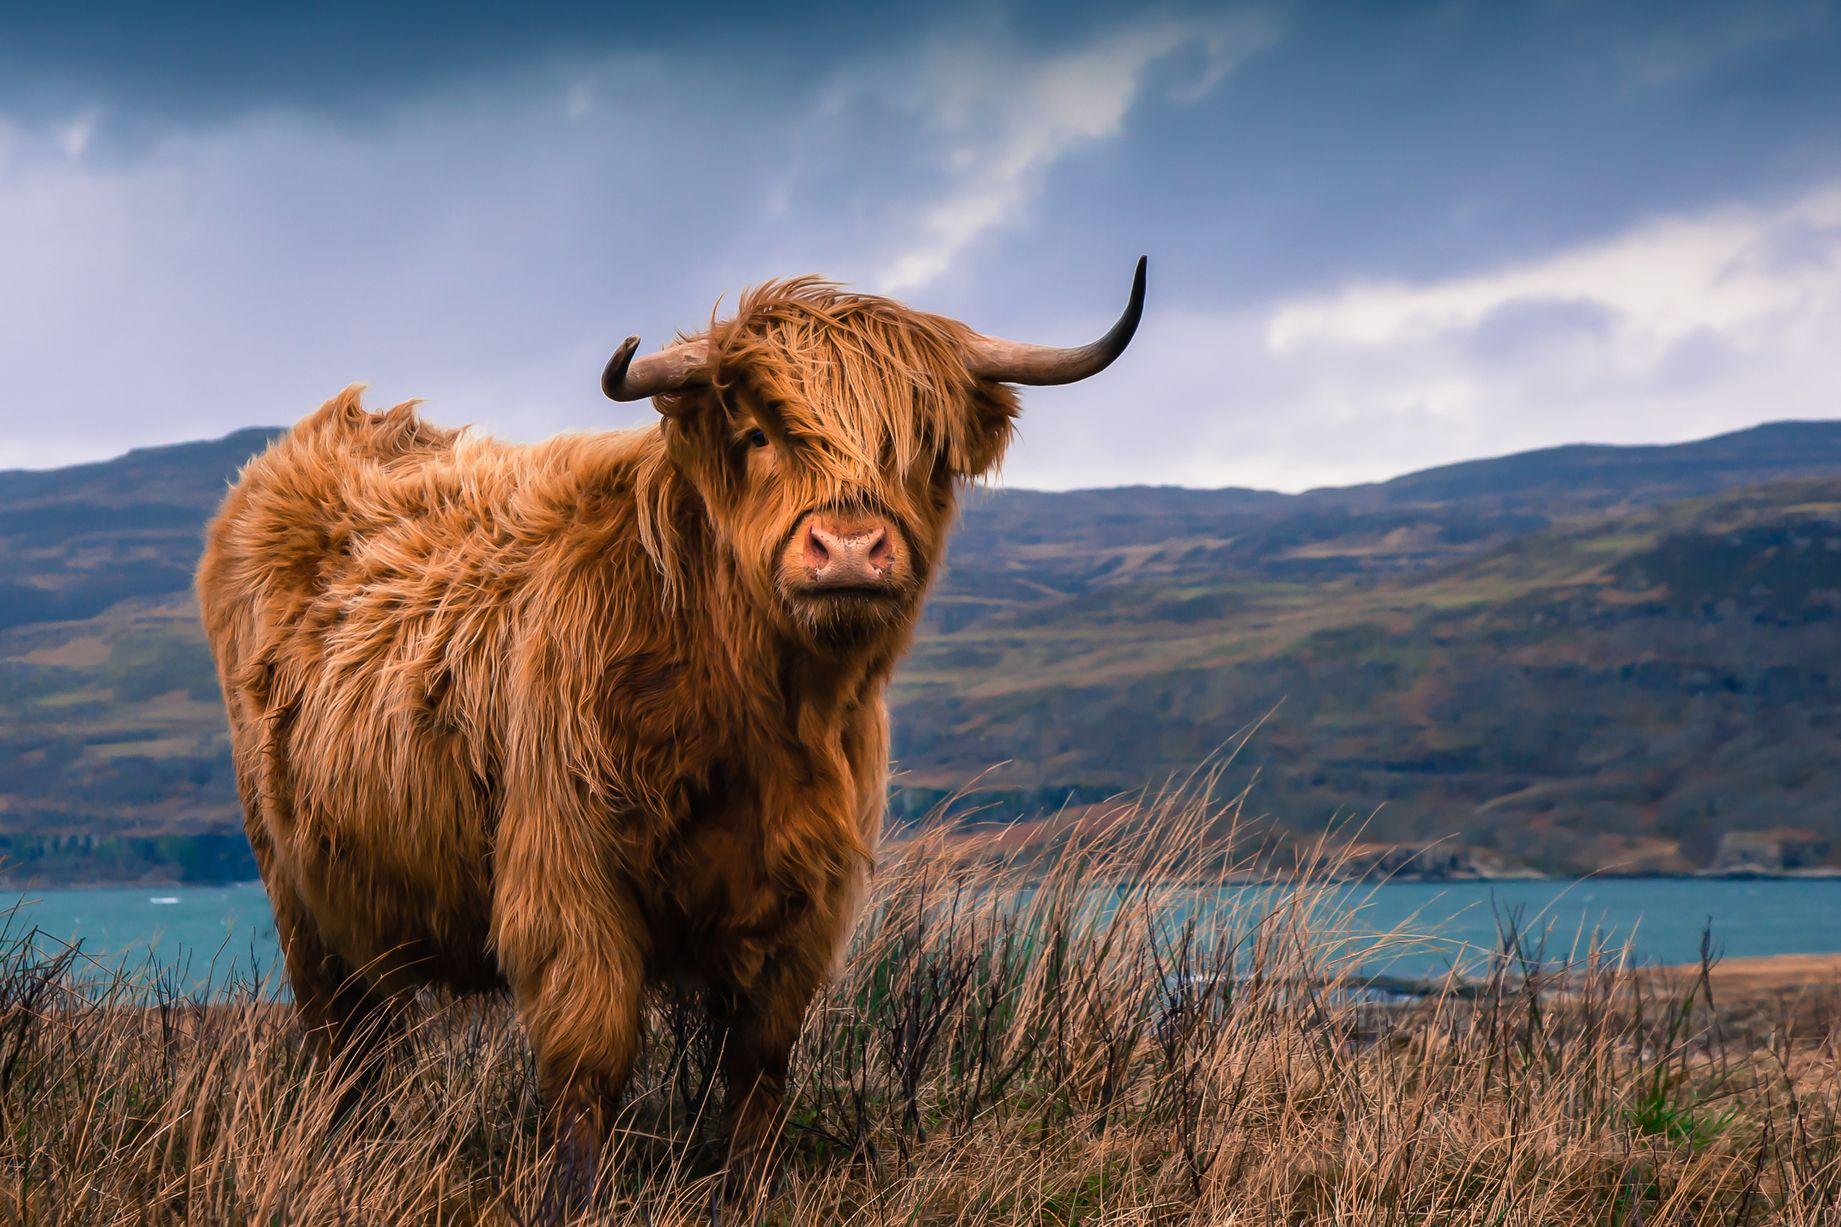 Highland's cow photo